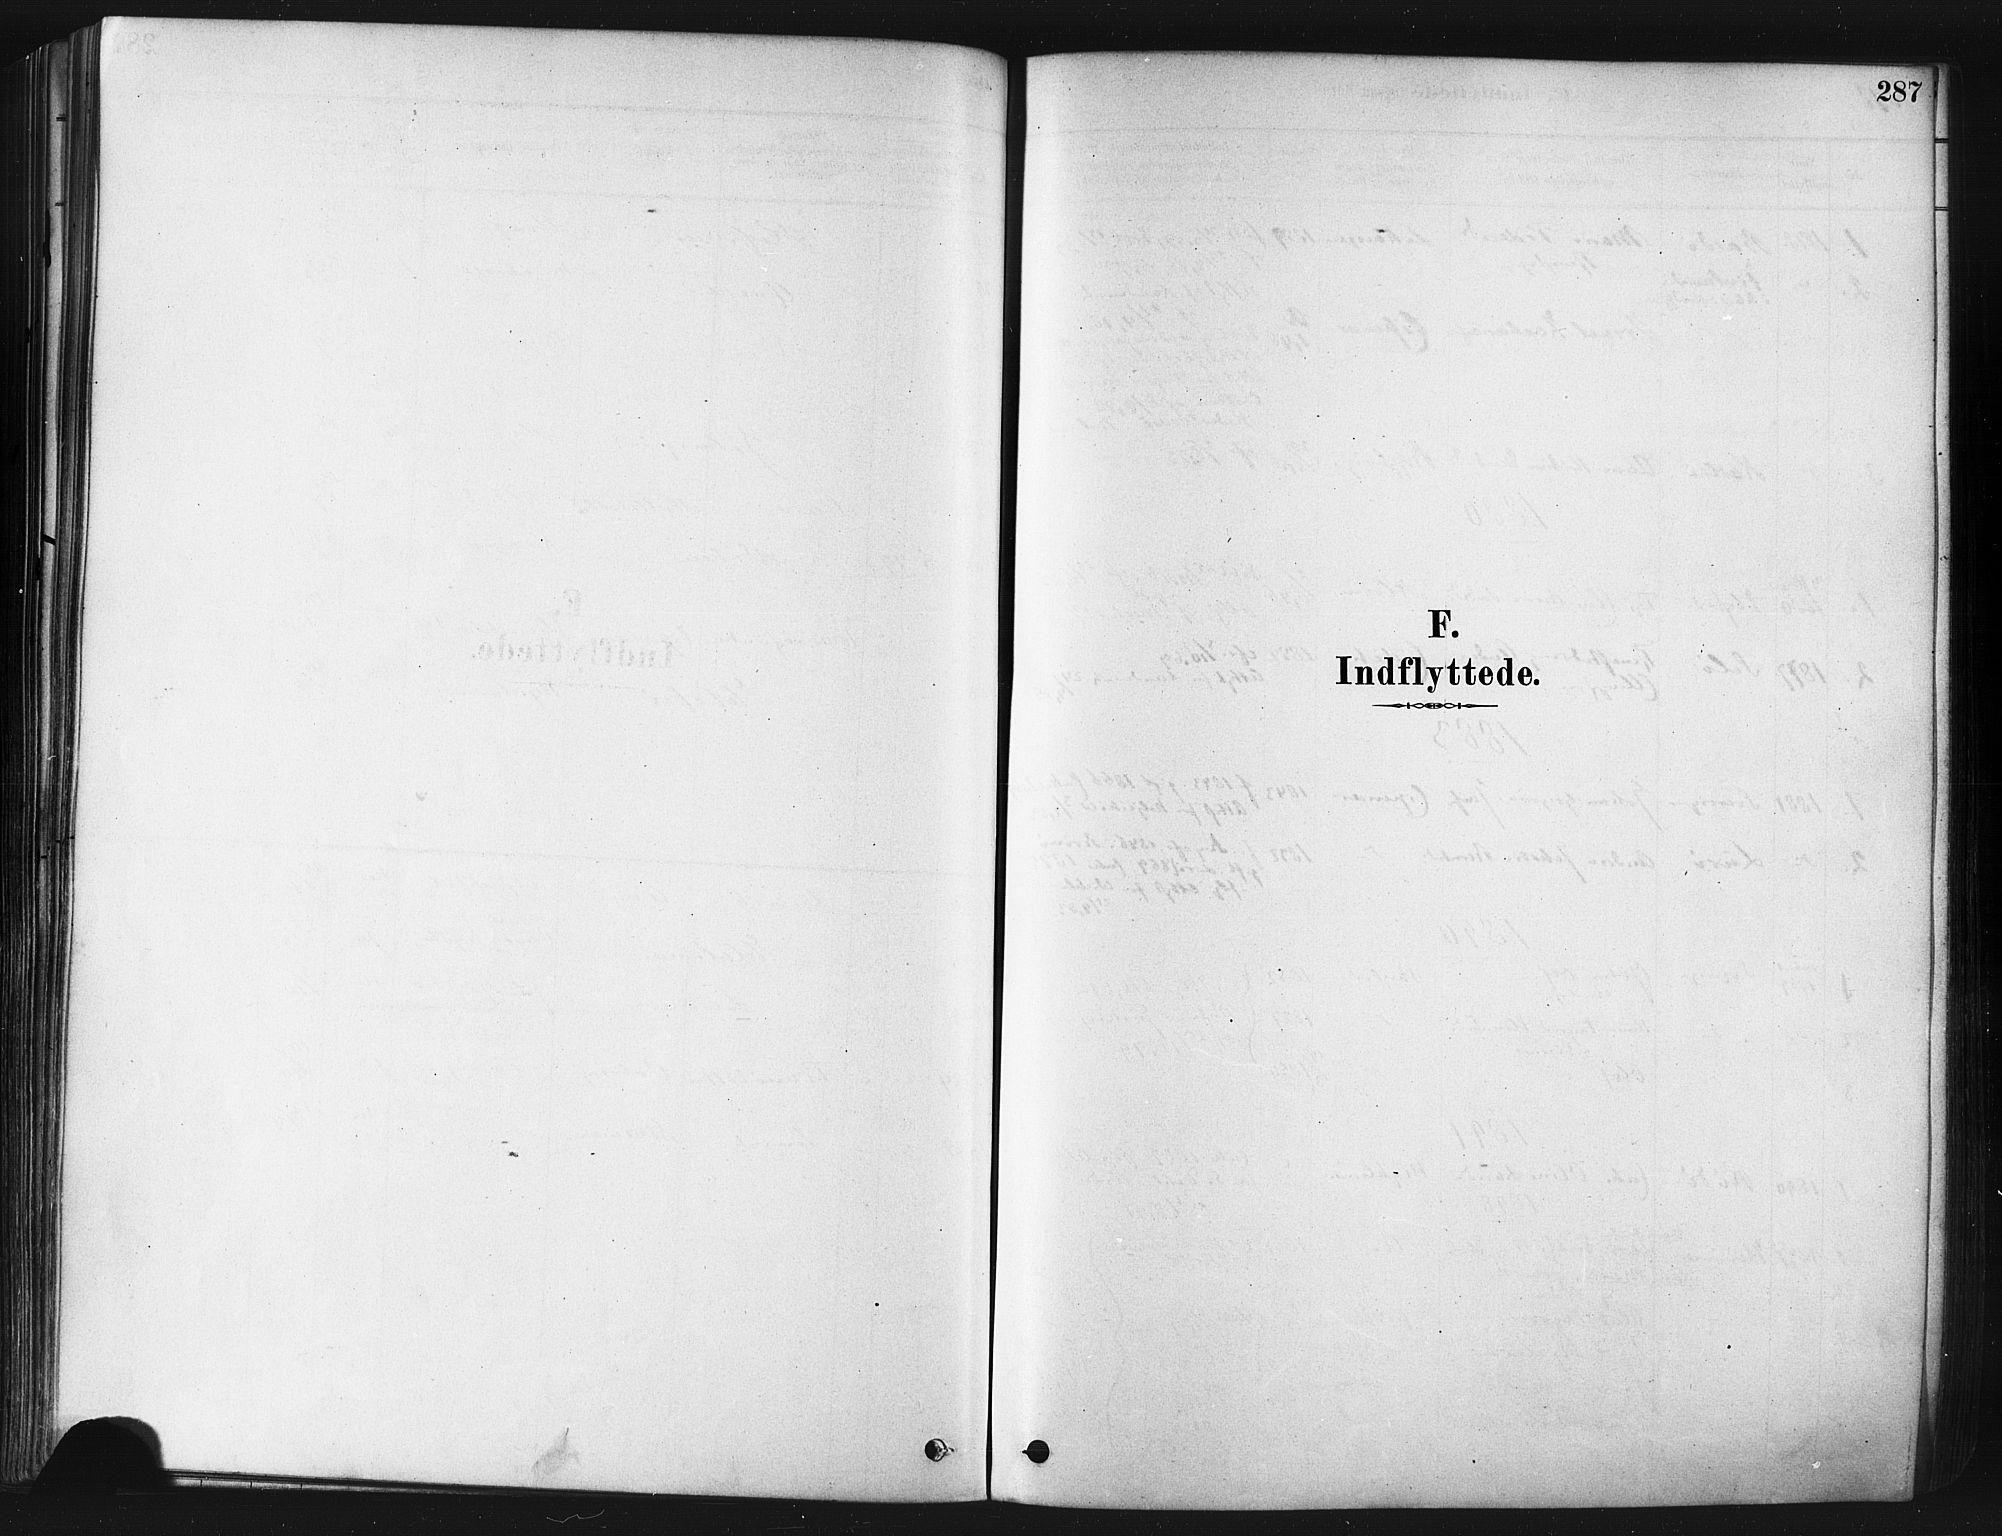 SATØ, Tranøy sokneprestkontor, I/Ia/Iaa/L0009kirke: Ministerialbok nr. 9, 1878-1904, s. 287